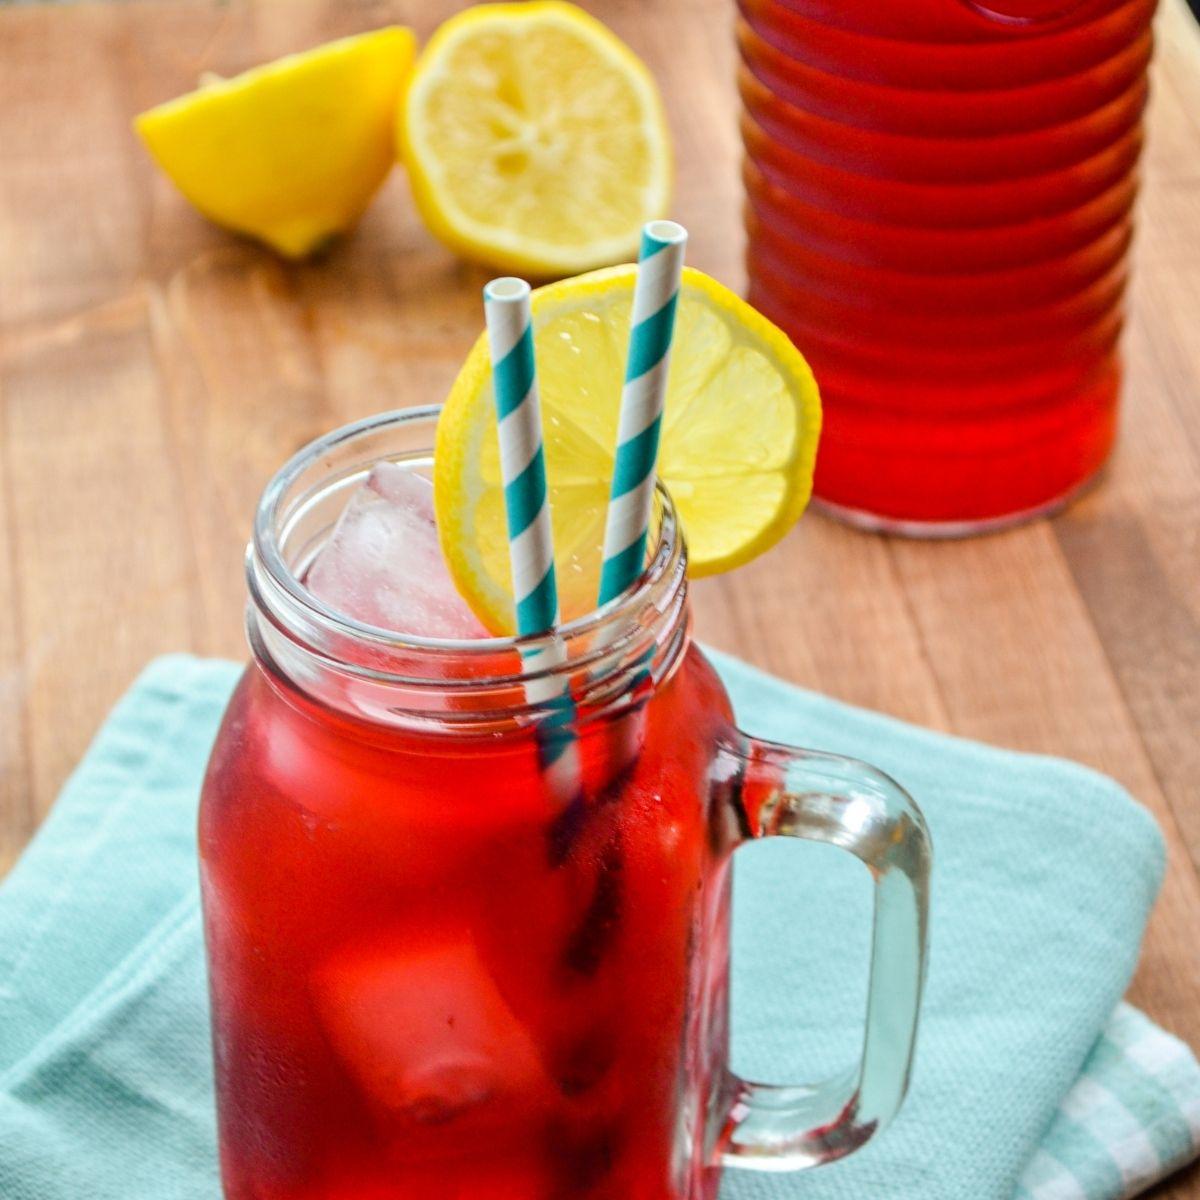 A glass of Passion Tea Lemonade, garnished with lemon wedges.